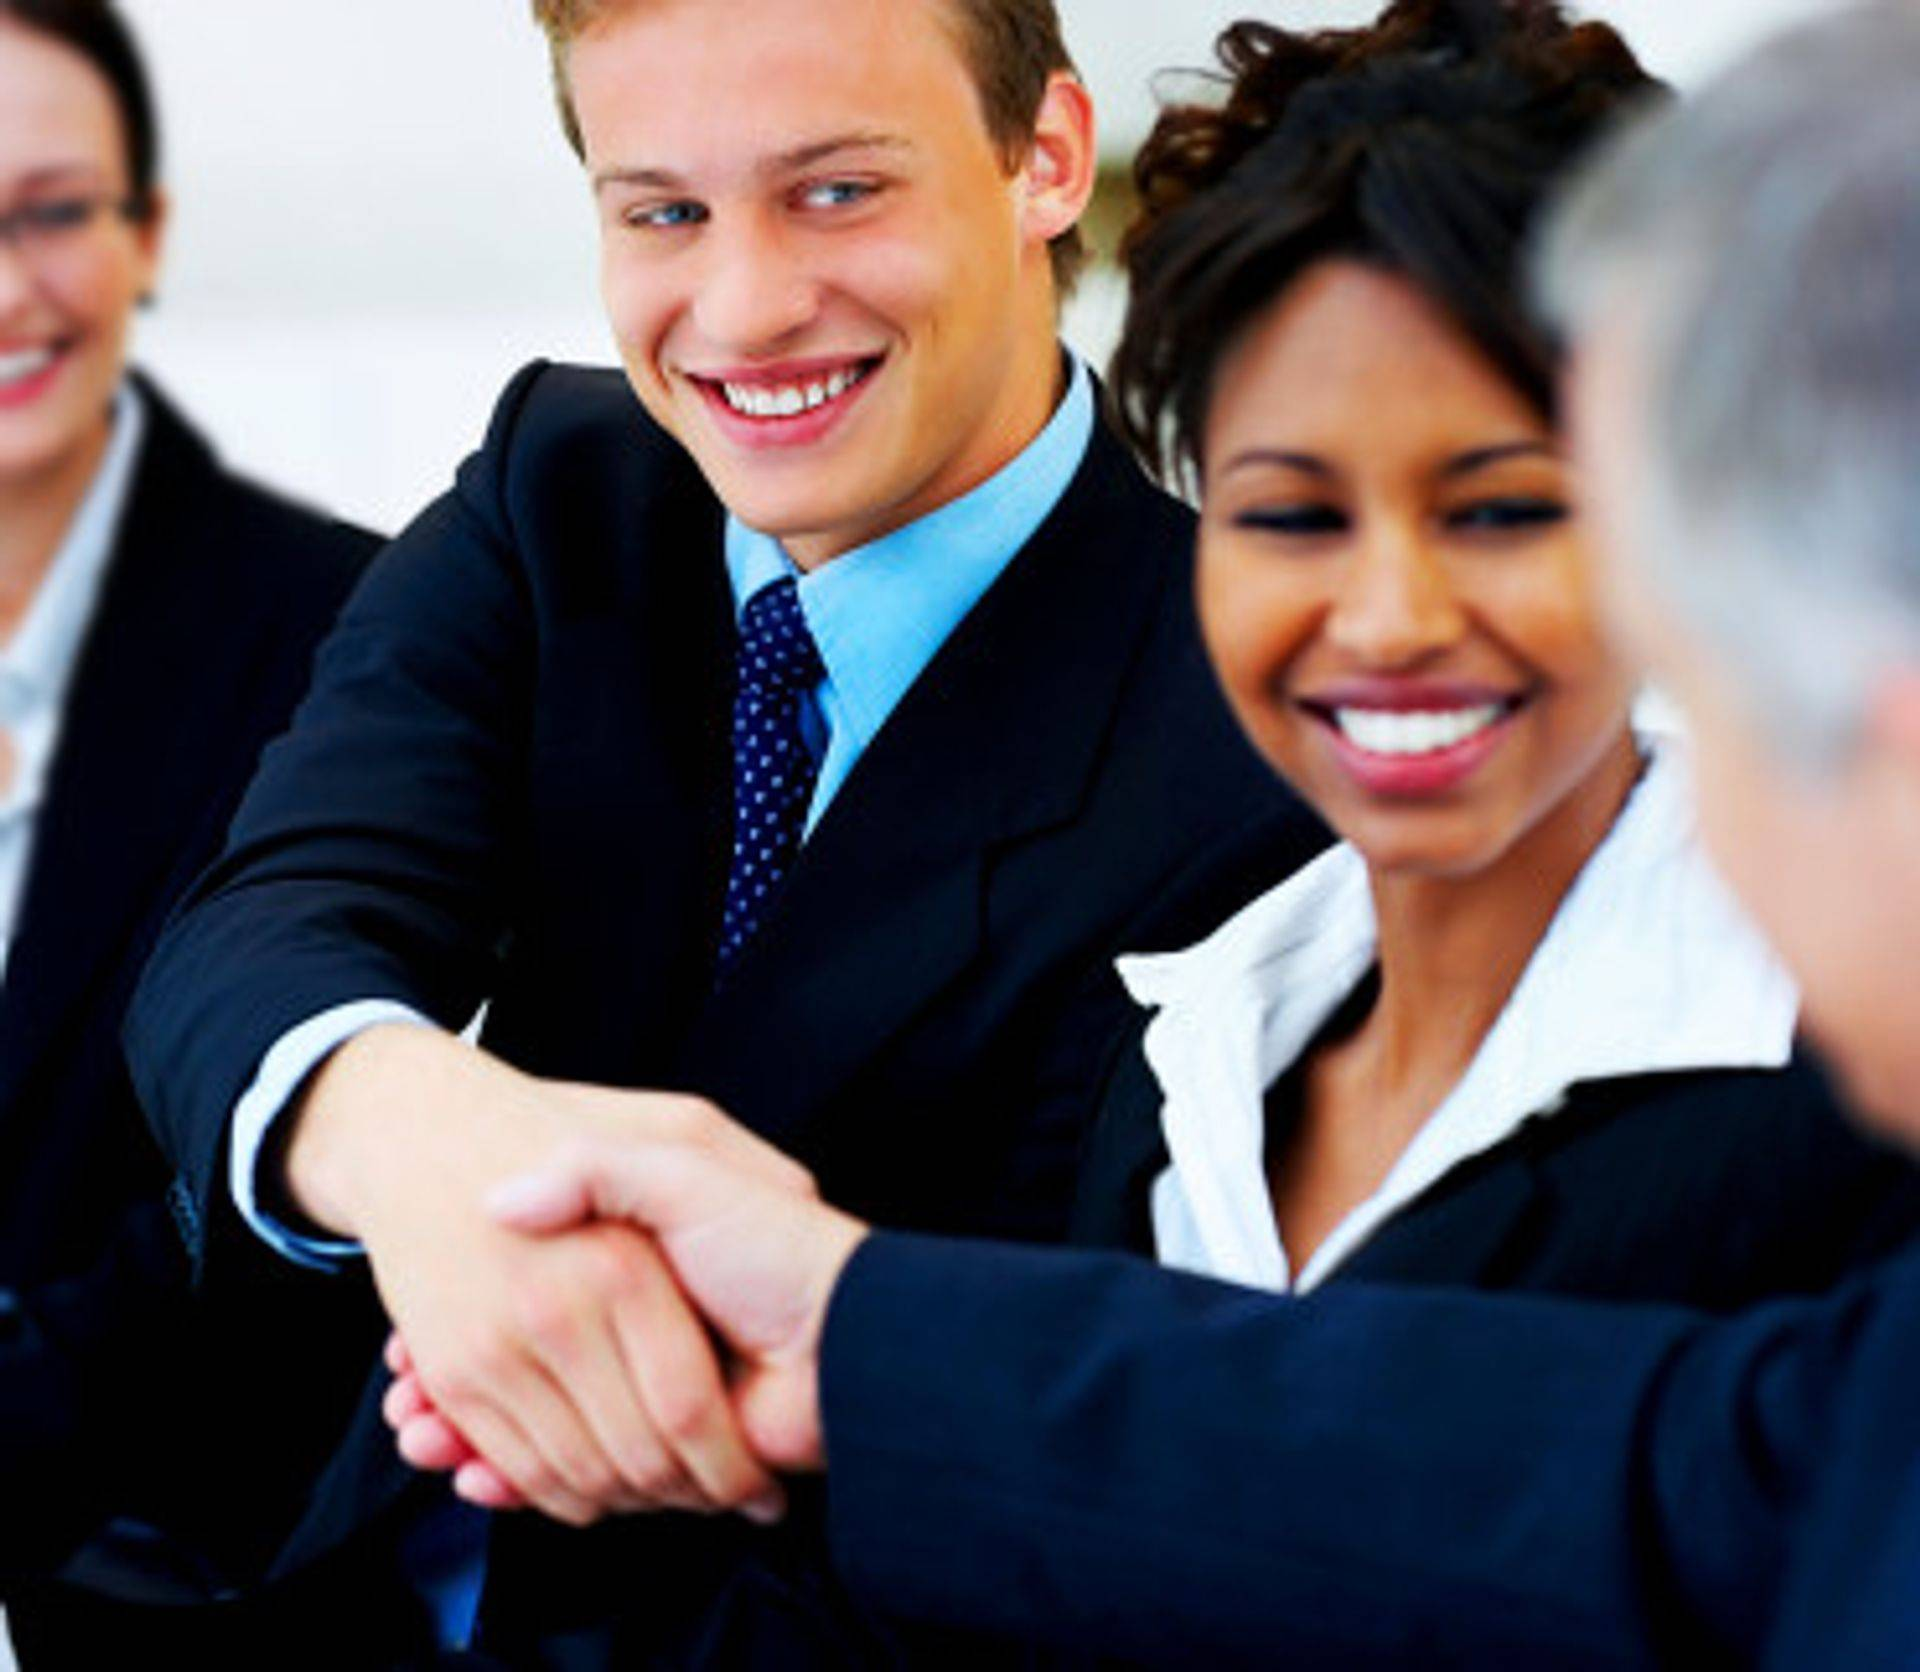 New Business Development across a range of industries